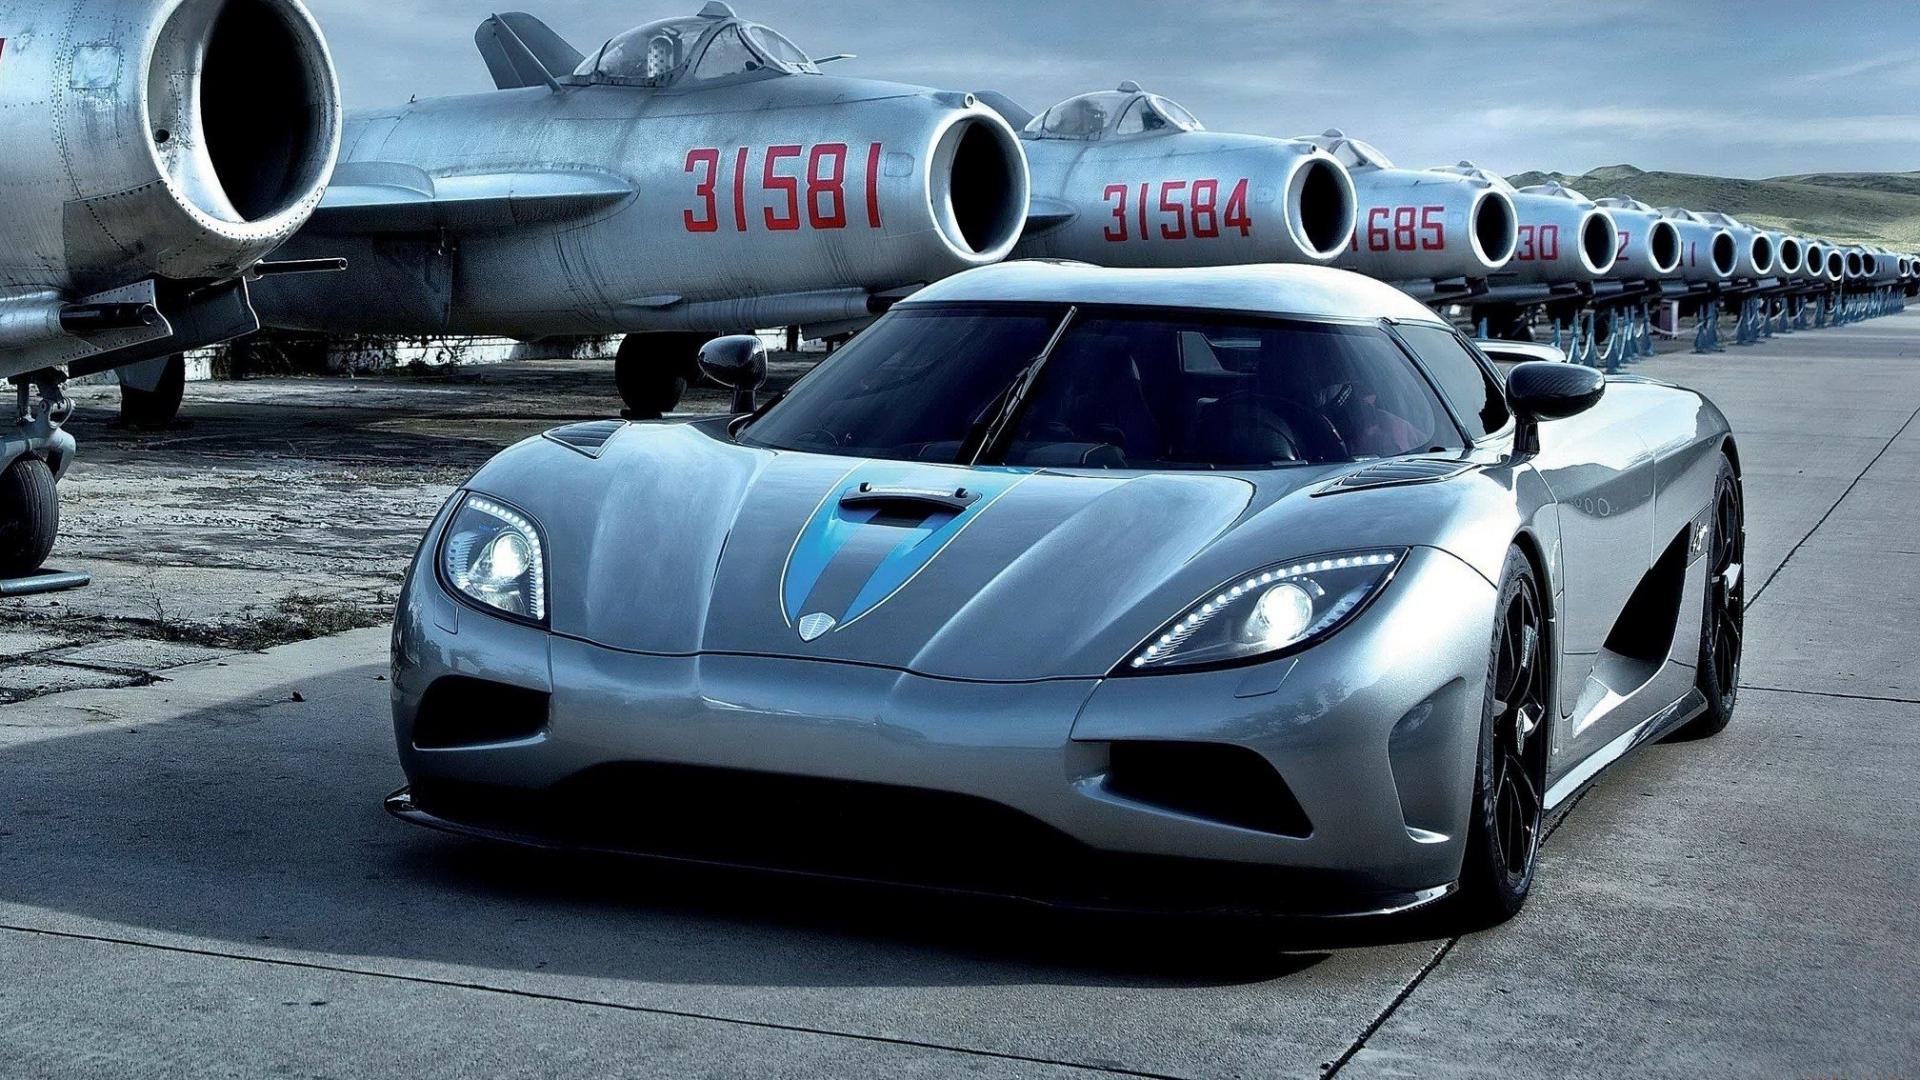 Gentil Koenigsegg, Auto, Car